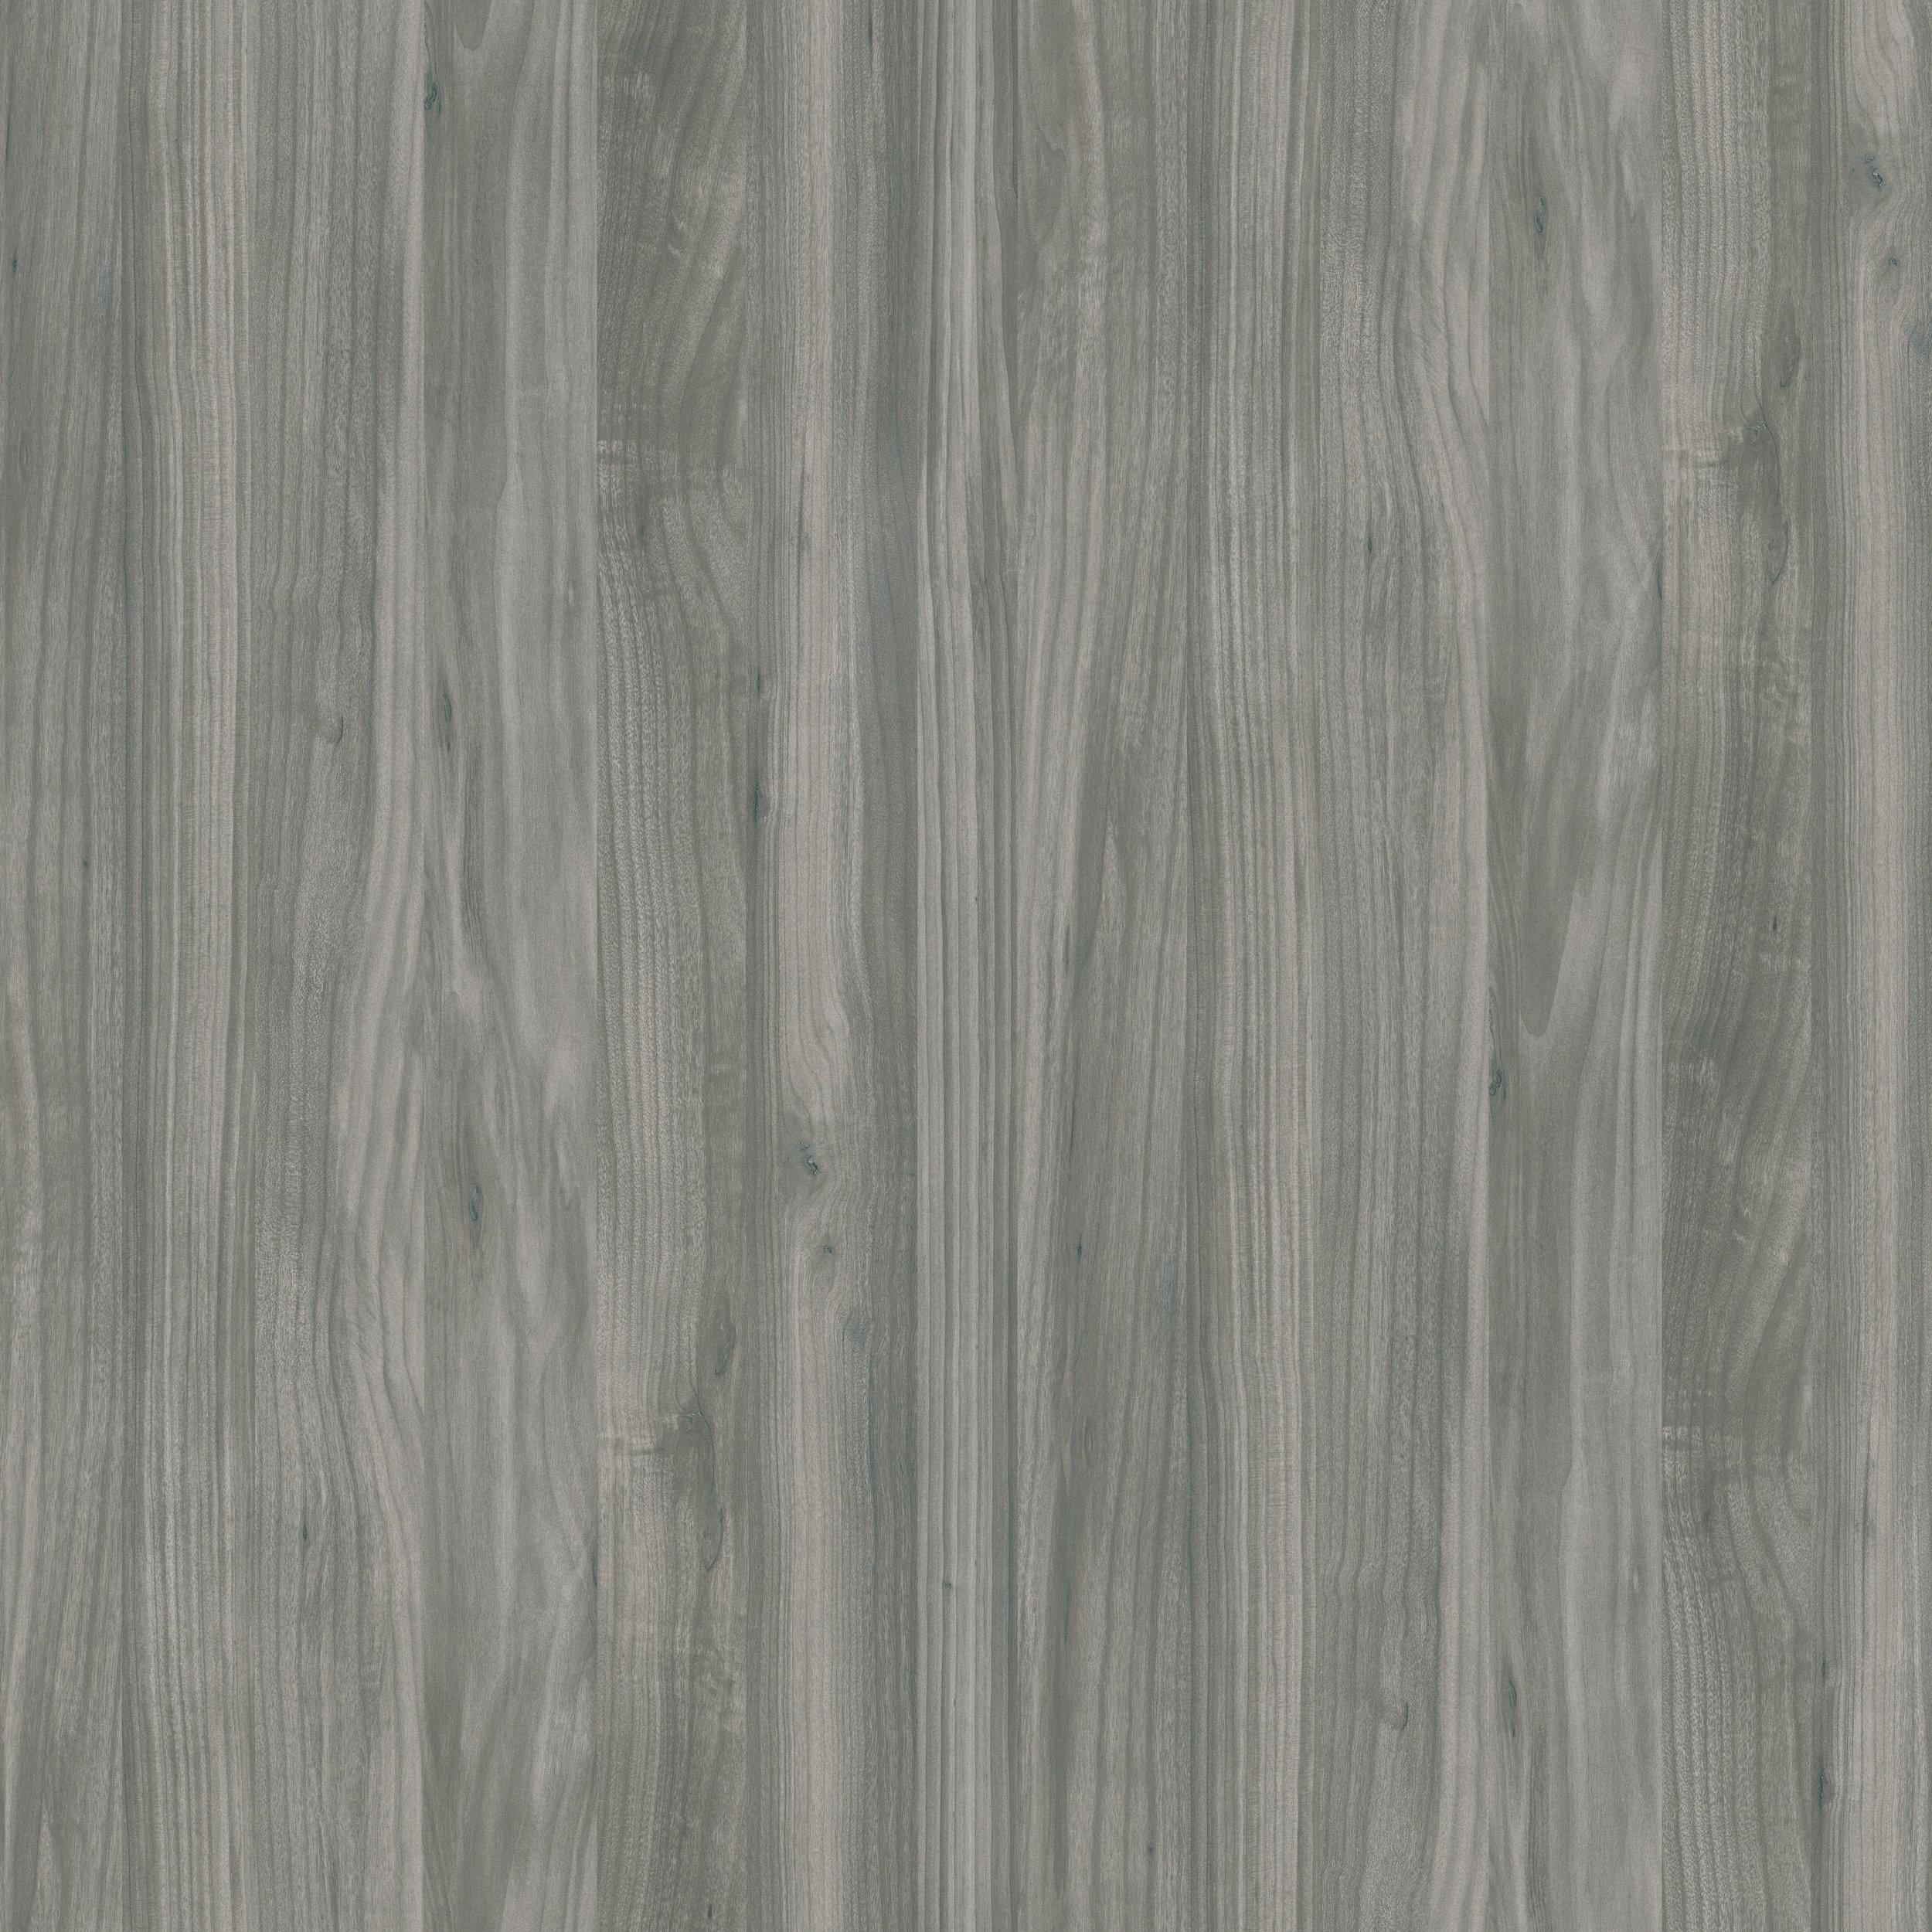 Glamour Wood Light 48005